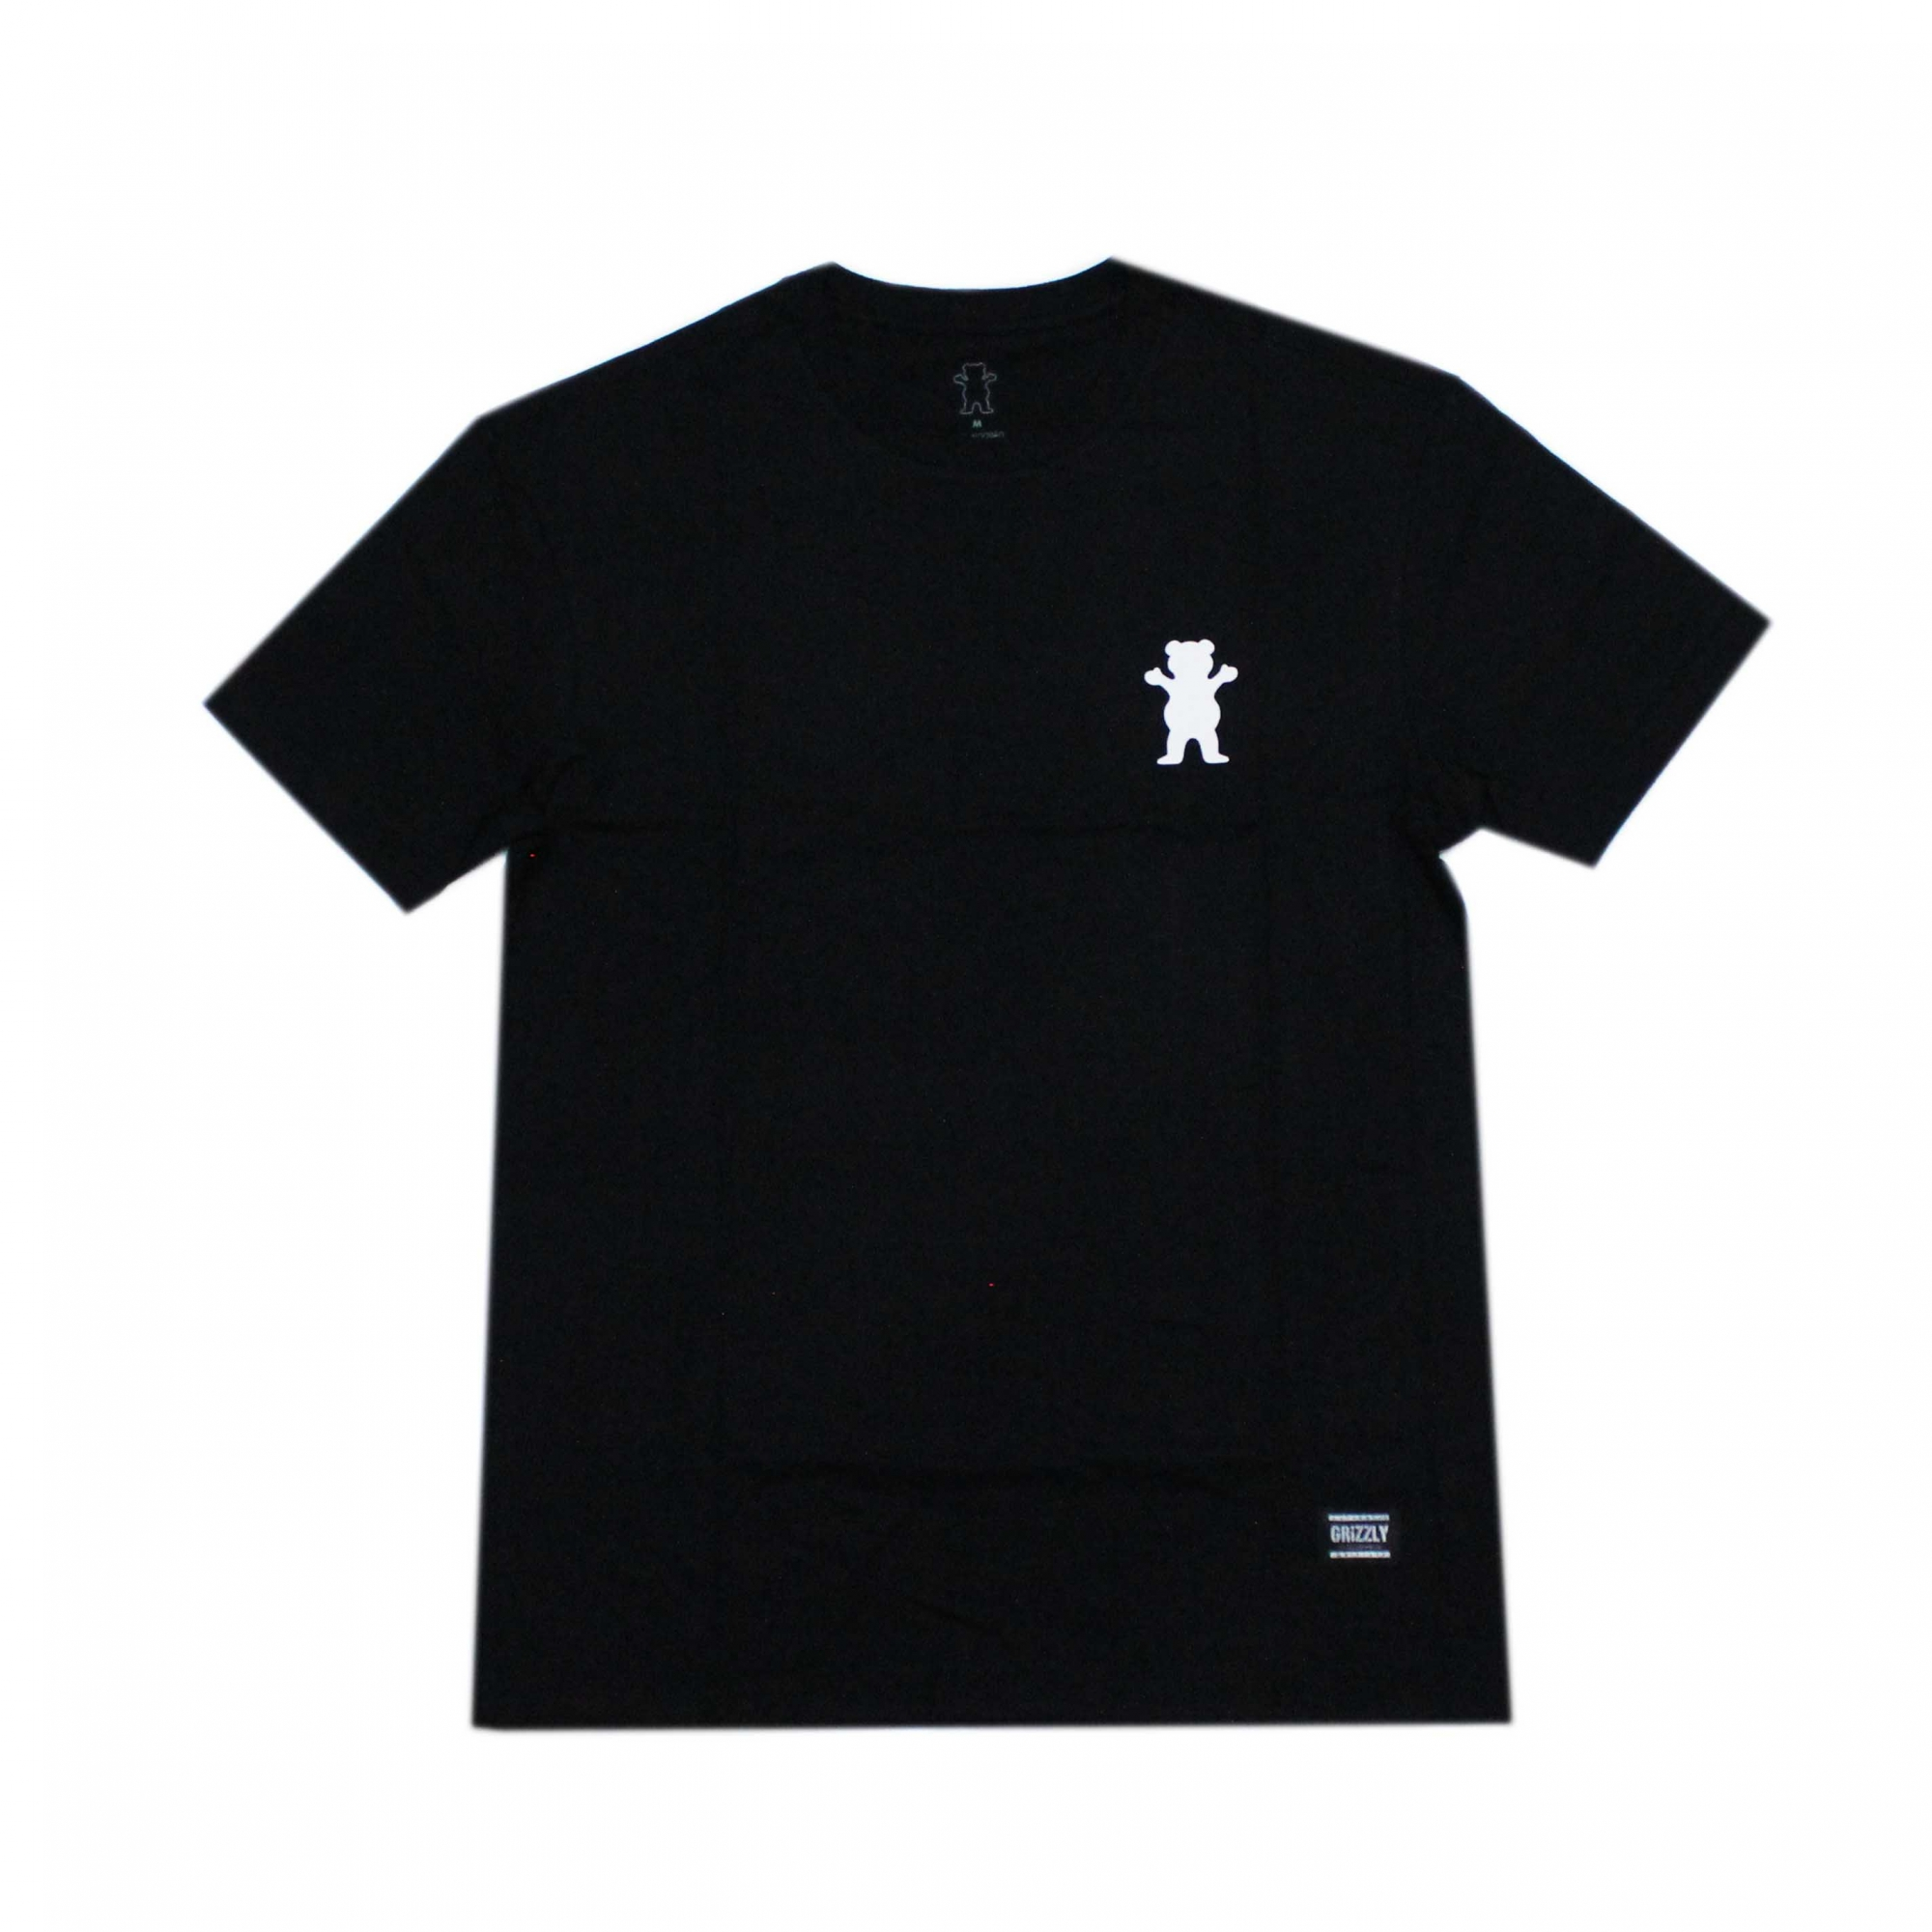 Camiseta Grizzly Stampback - Preto